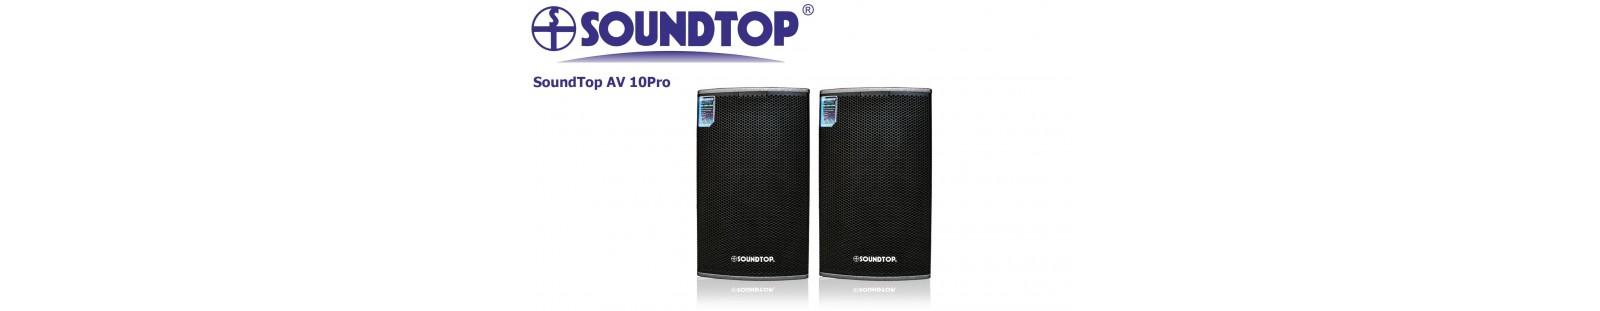 SoundTop AV 10Pro